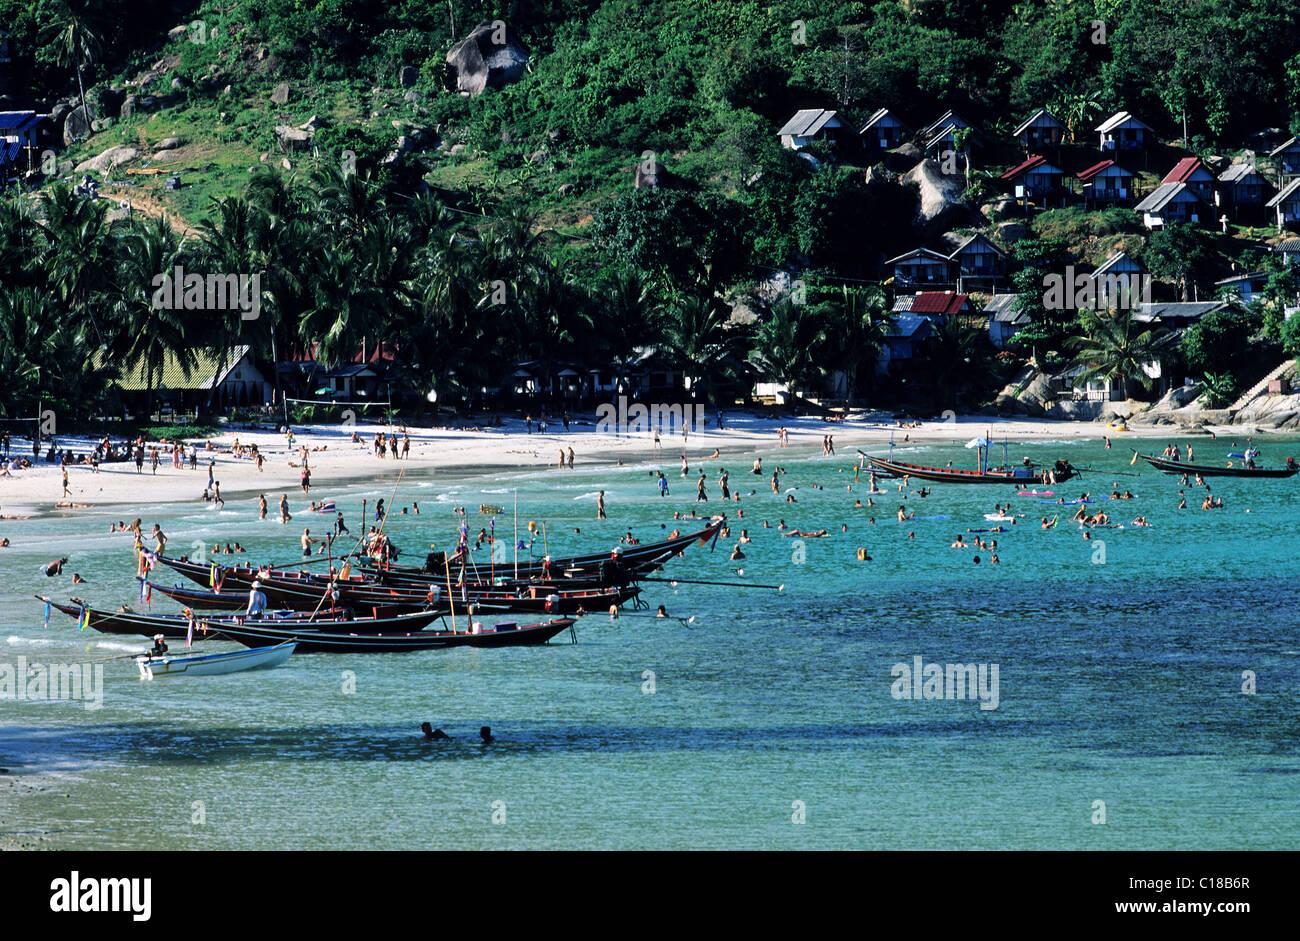 Thailand, Samui Islands archipelago, Full Moon Party on Koh Pha-Ngan Island, Had Rin beach - Stock Image